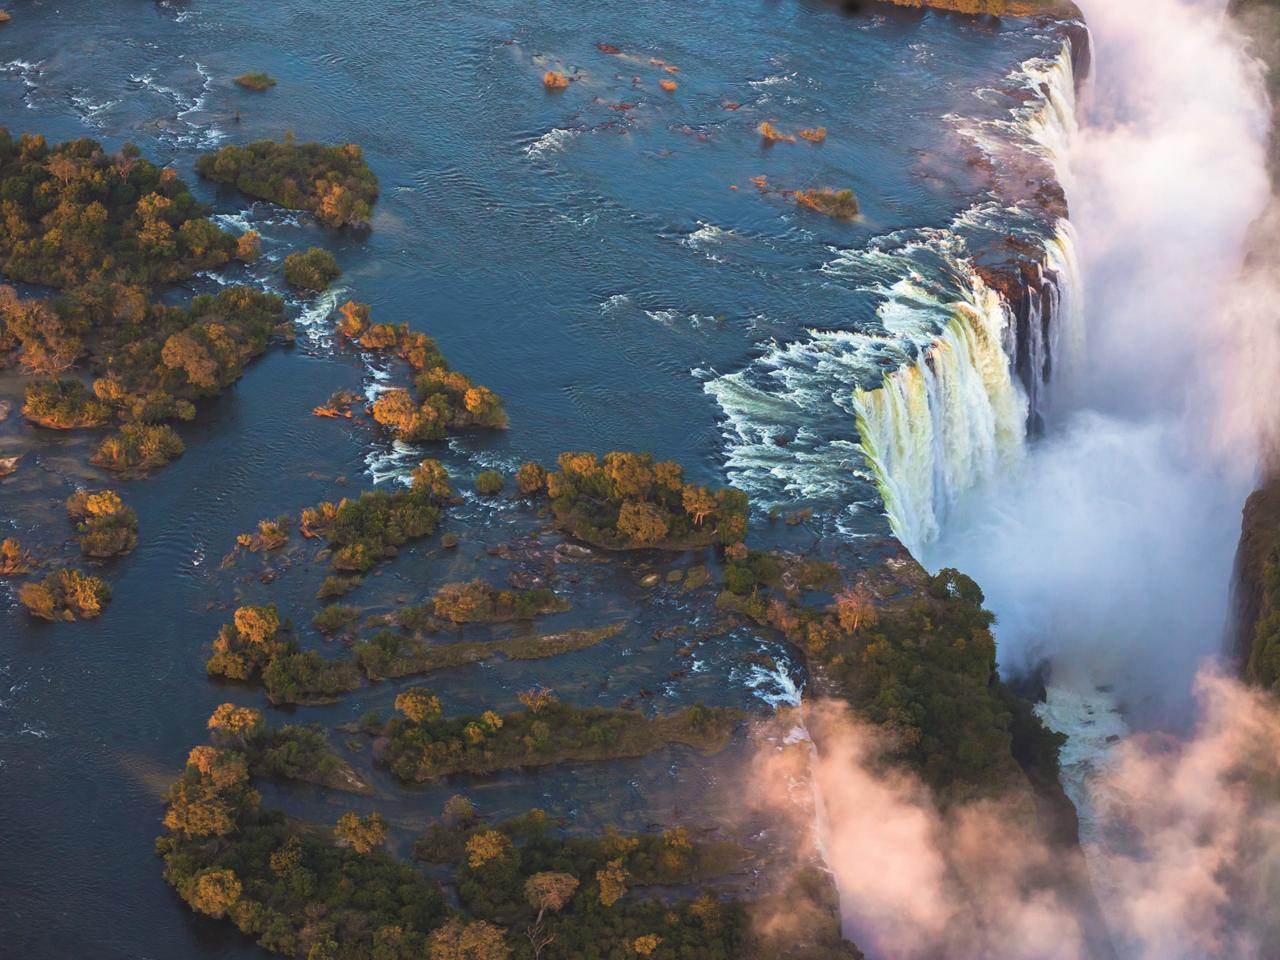 The awe-inspiring cascade of Victoria Falls. Picture: e2dan/ Shutterstock